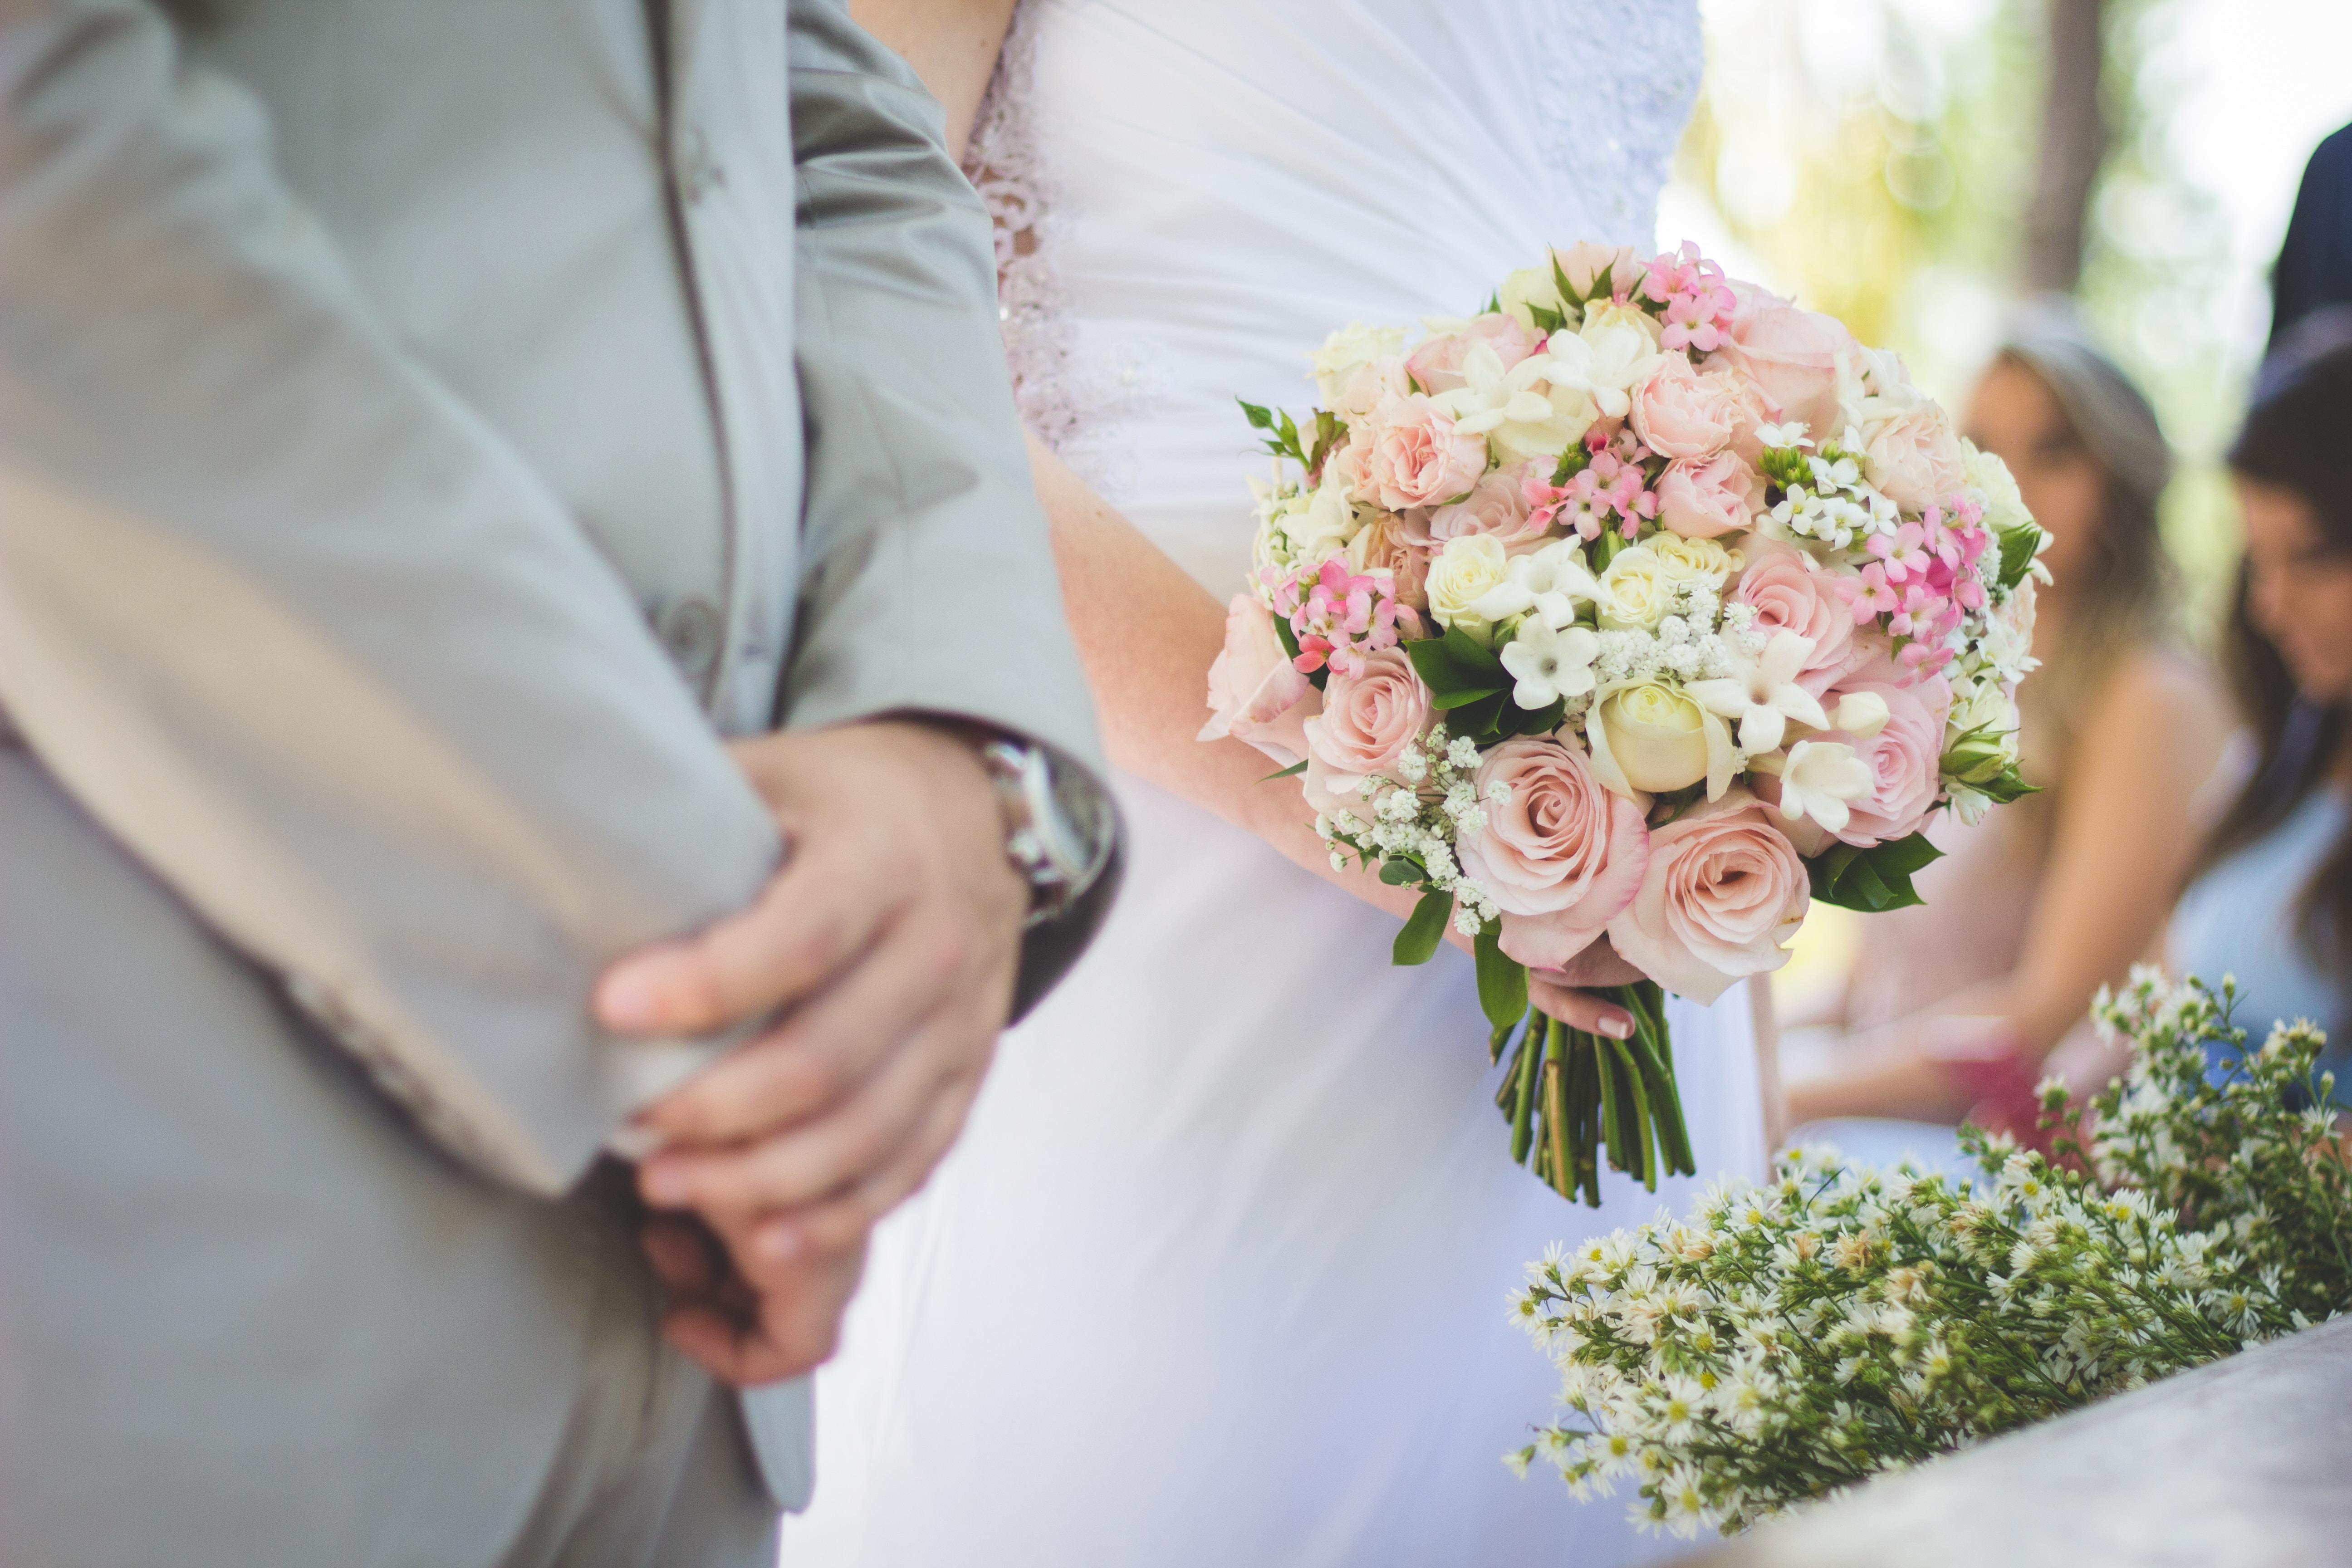 Guests blurred behind bride and groom on Marília wedding day